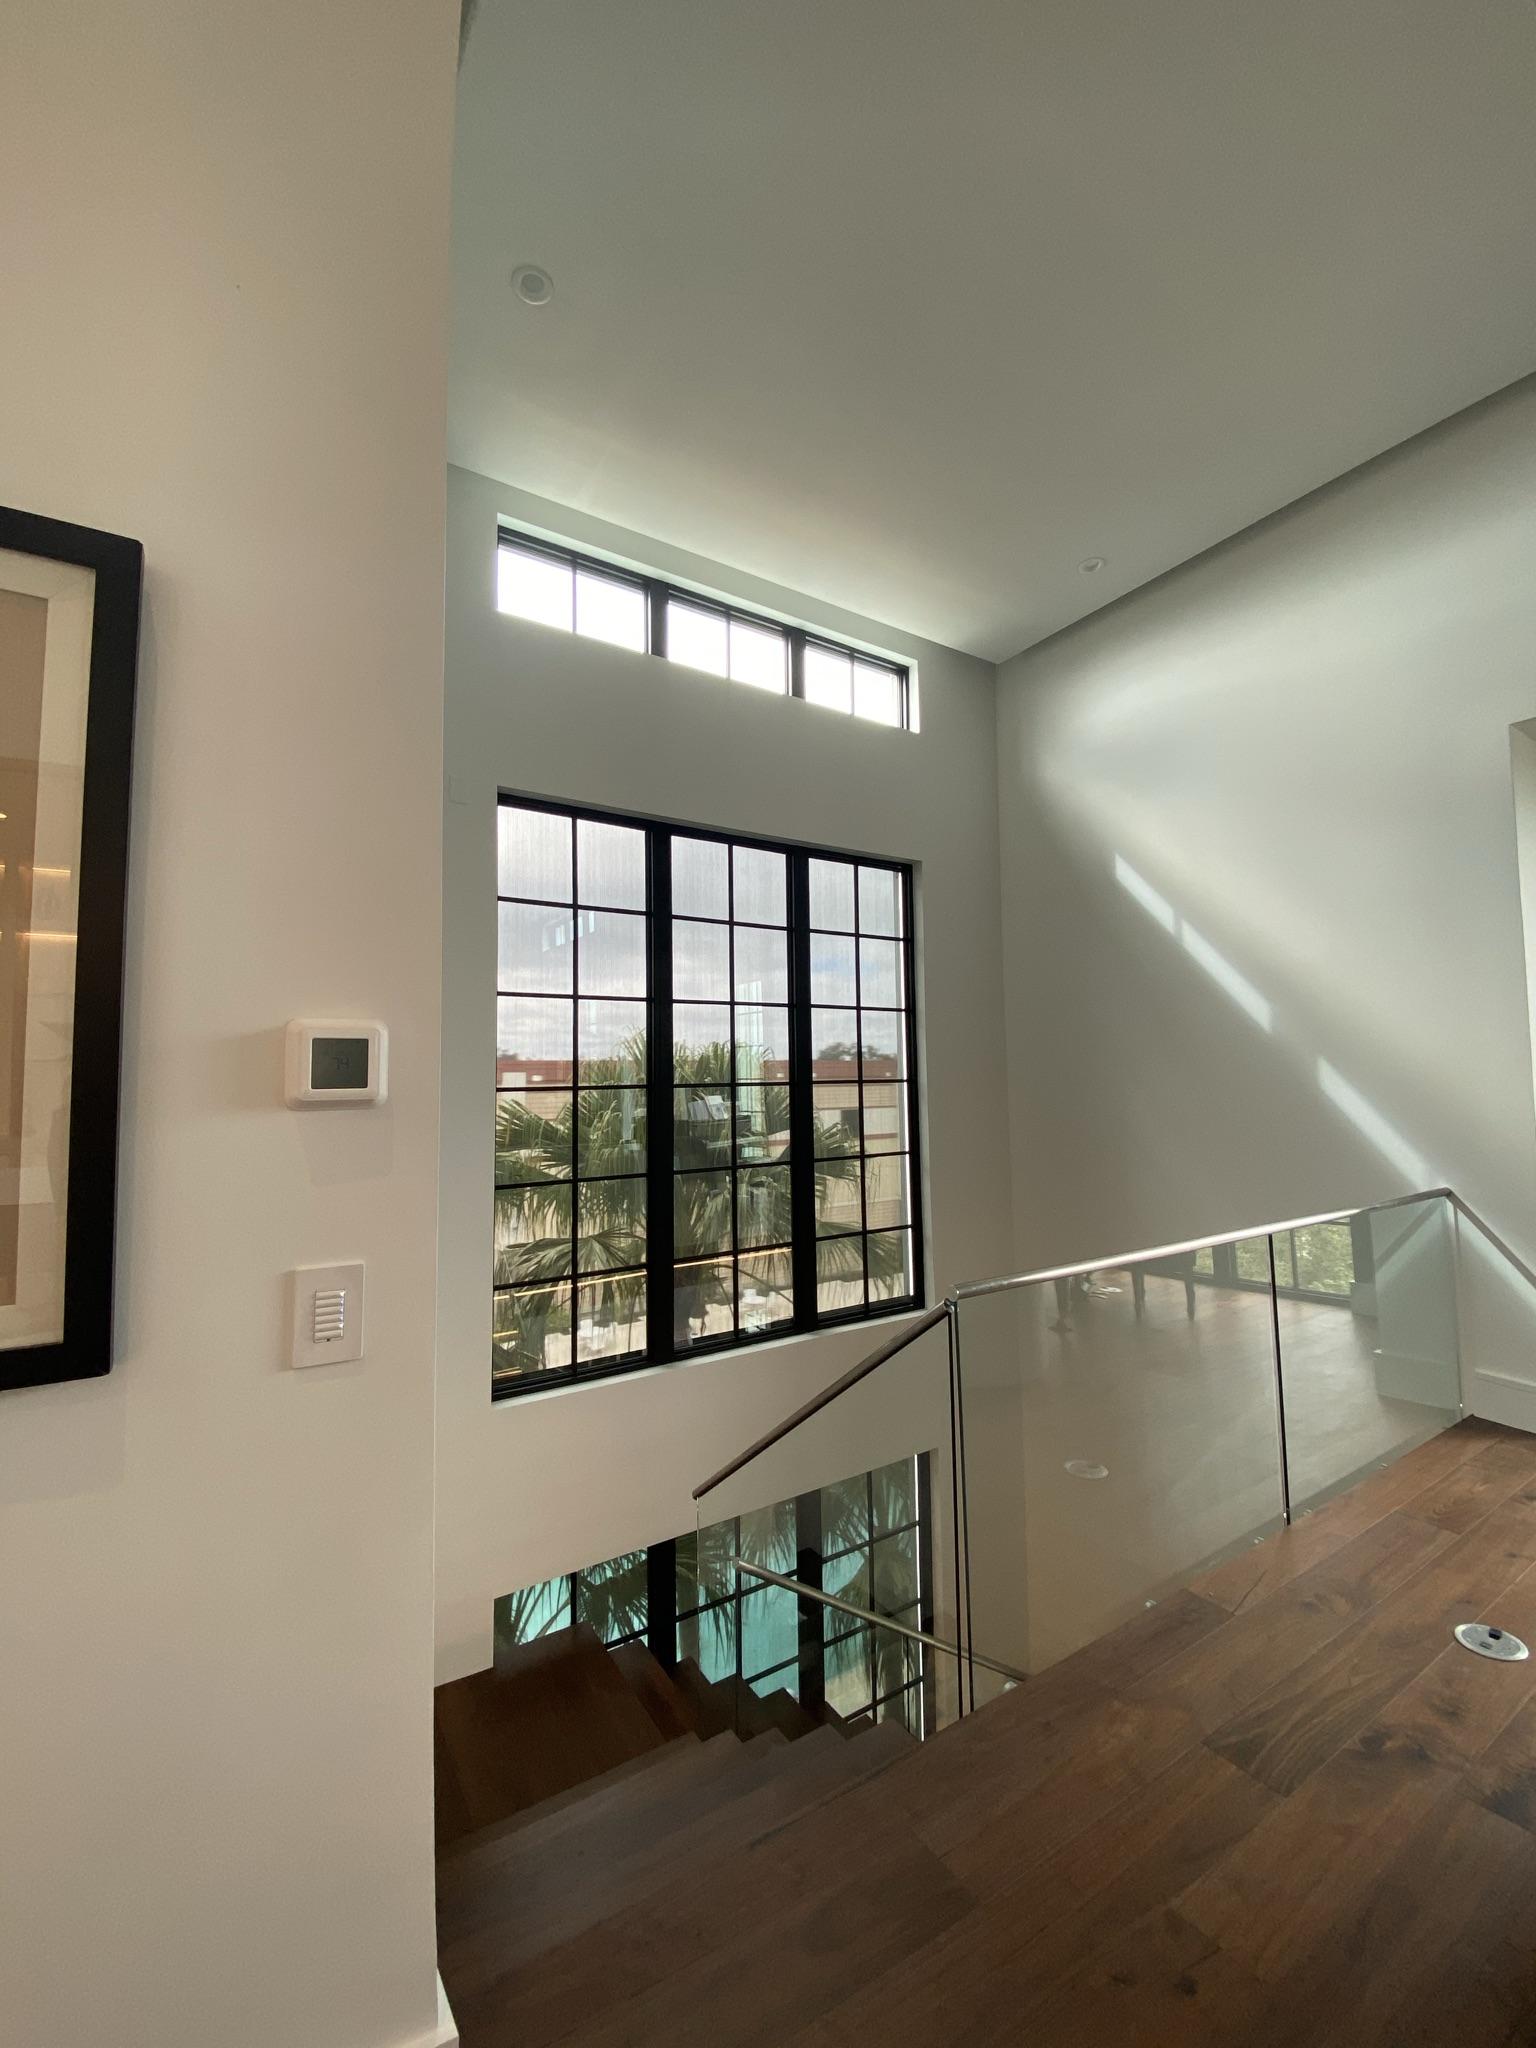 Commercial Window Film in Orlando Florida